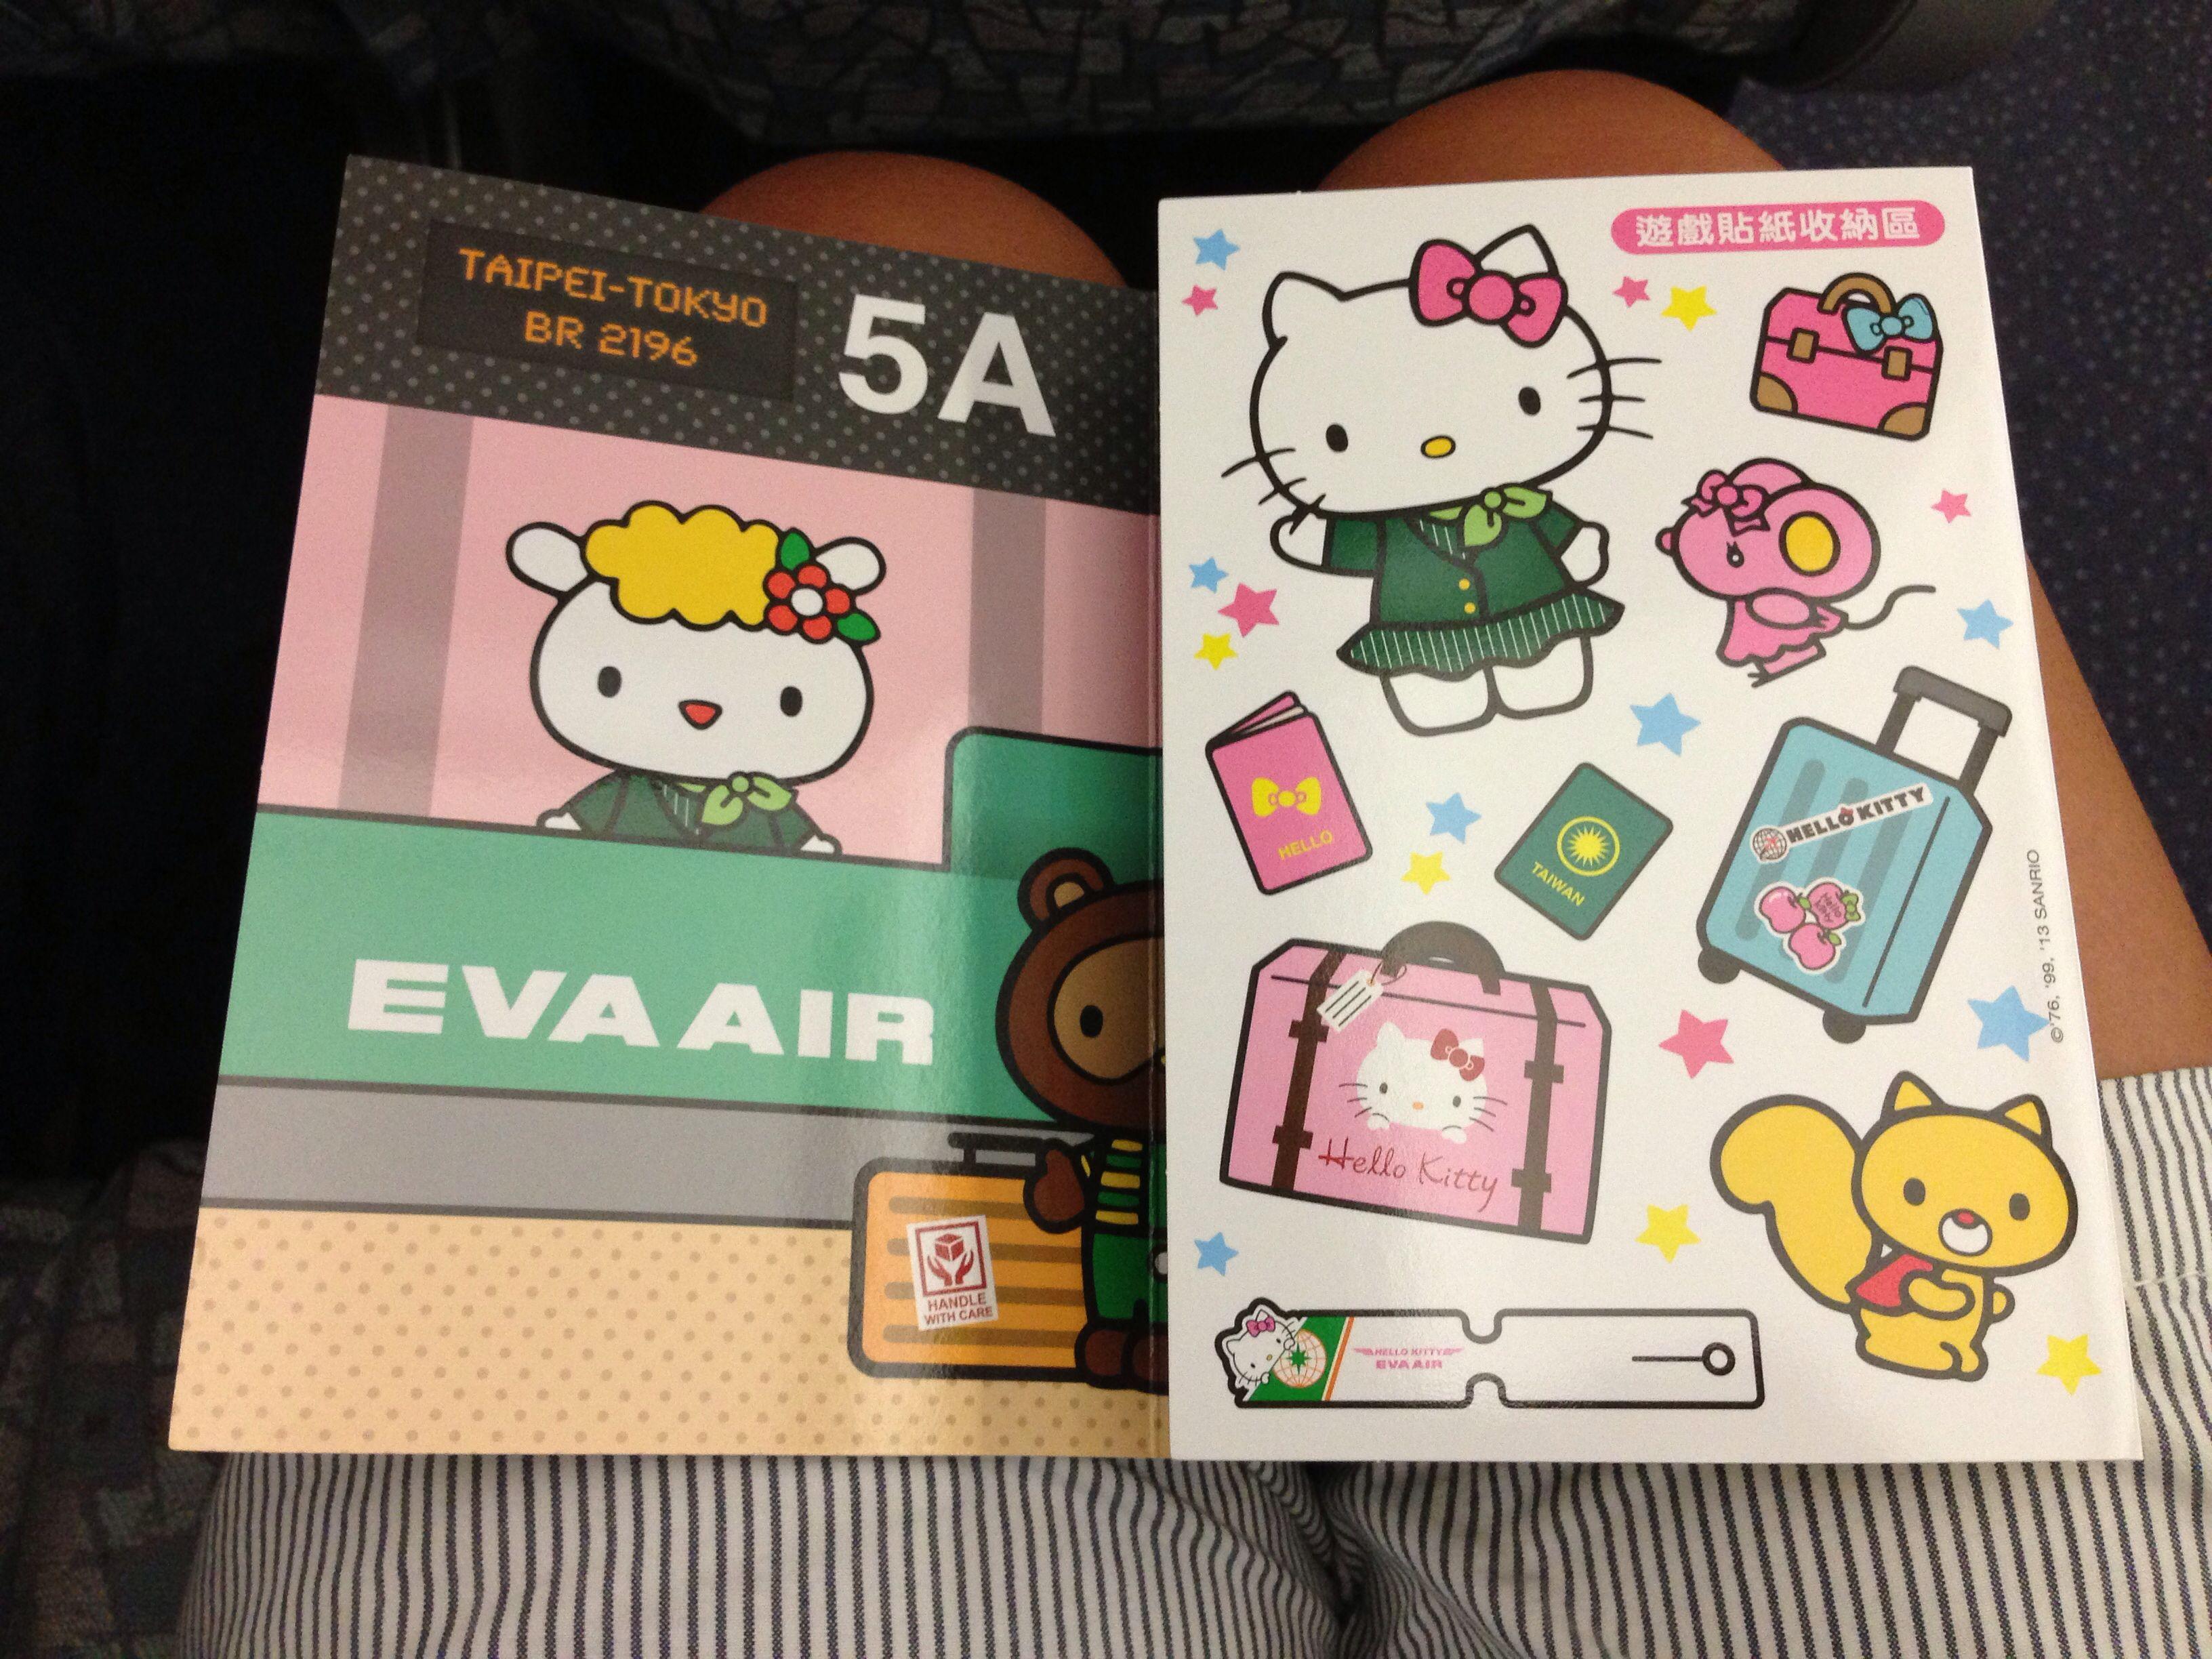 EVA Airways children's fun pack Taipei, Taiwan, Fun